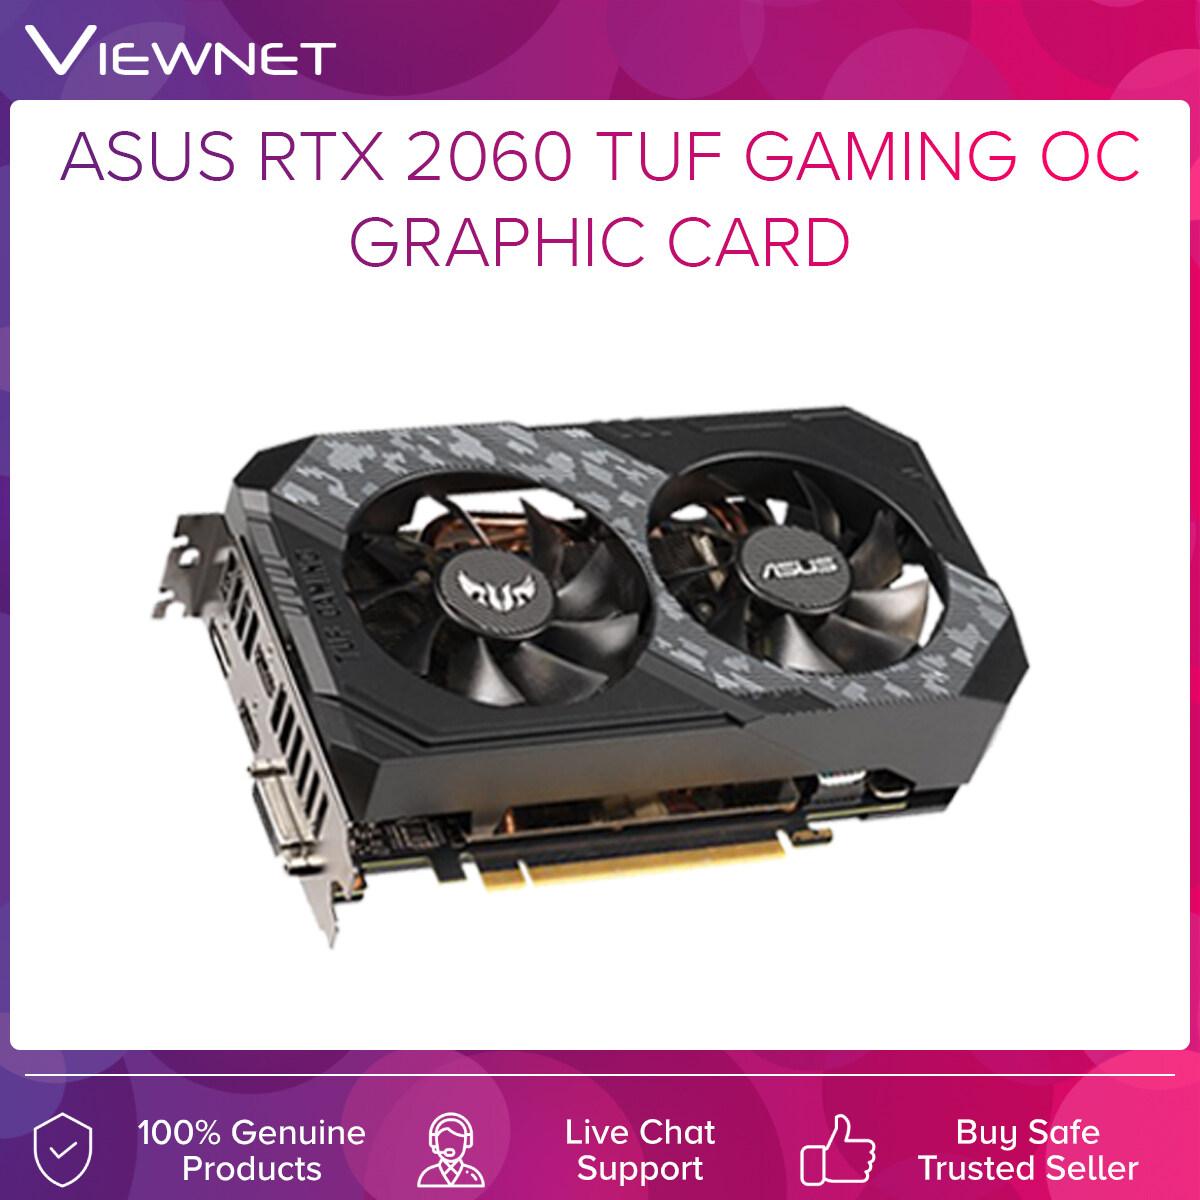 Viewnet Gaming PC AMD Ryzen 5 2600 Processor/Asus B450M TUF Pro Gaming S Motherboard/Adata D10 8GB PC3200 x2 DDR4 Ram/Adata SX8200 Pro M.2 SSD/Asus RTX2060 6GB TUF Gaming OC Graphics Card/Thermaltake M-ATX S100 Chassis/Aigo GP550W Power Supply